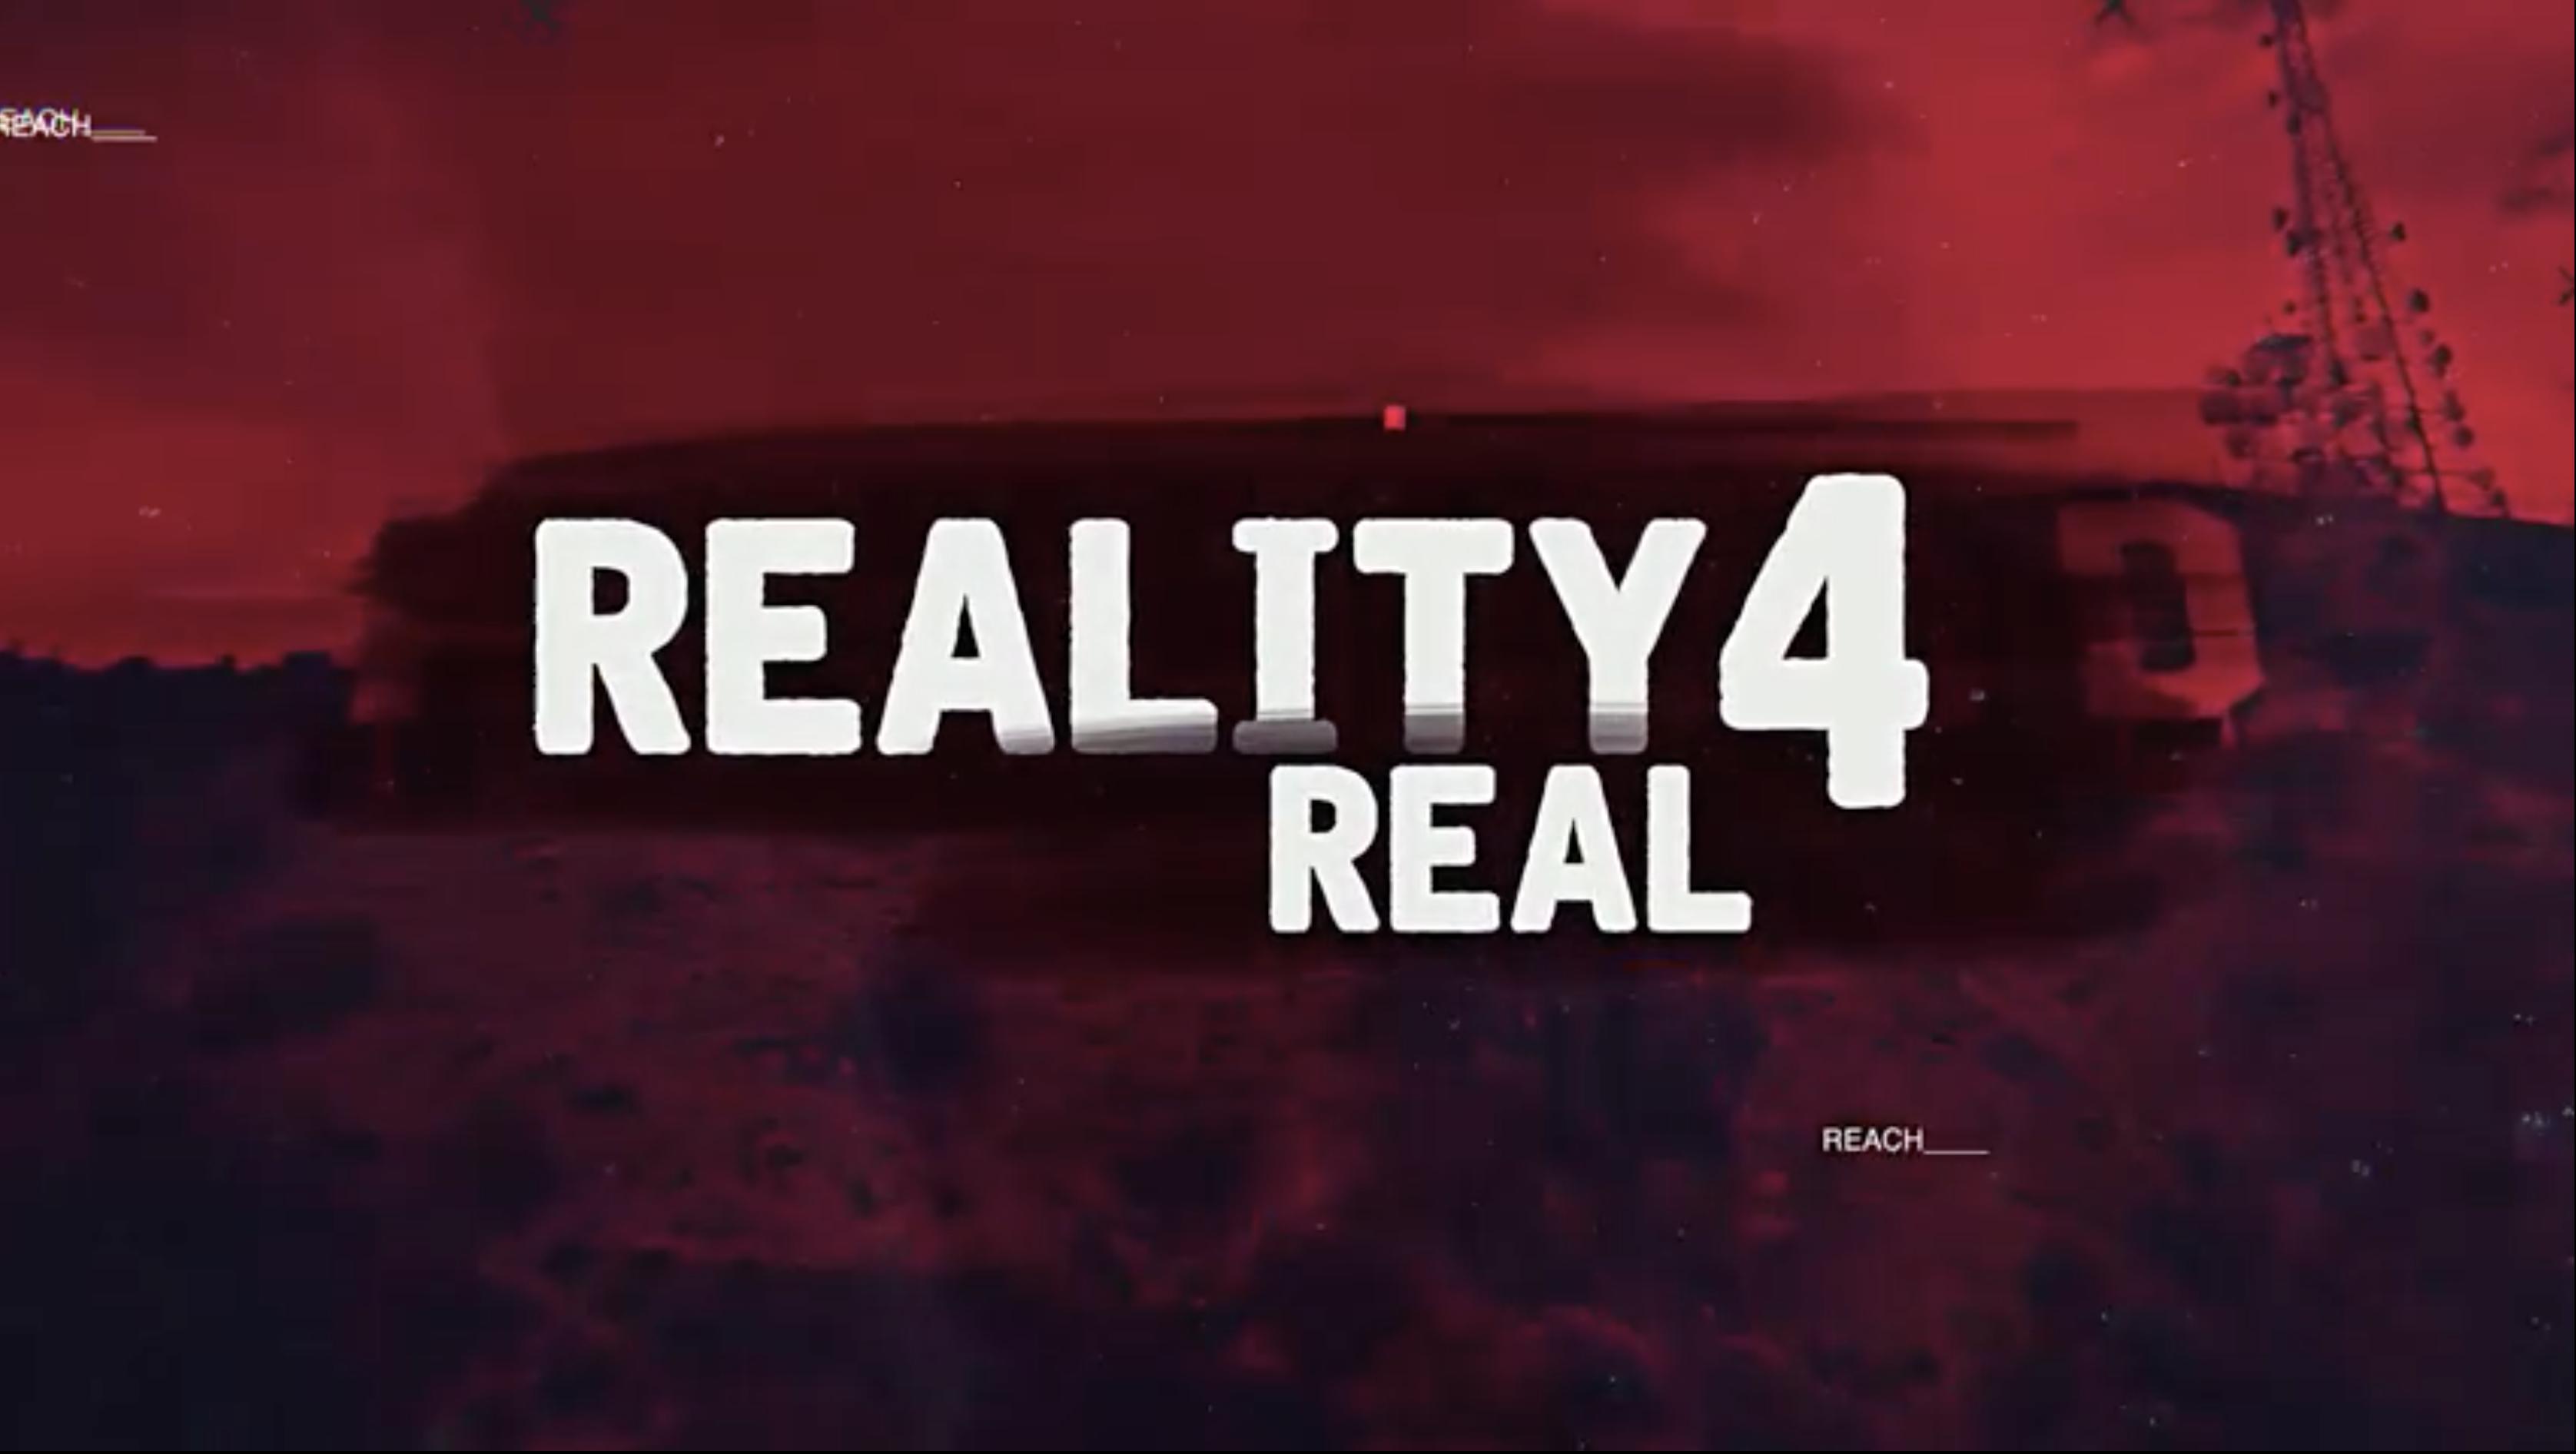 Reality 4 Real